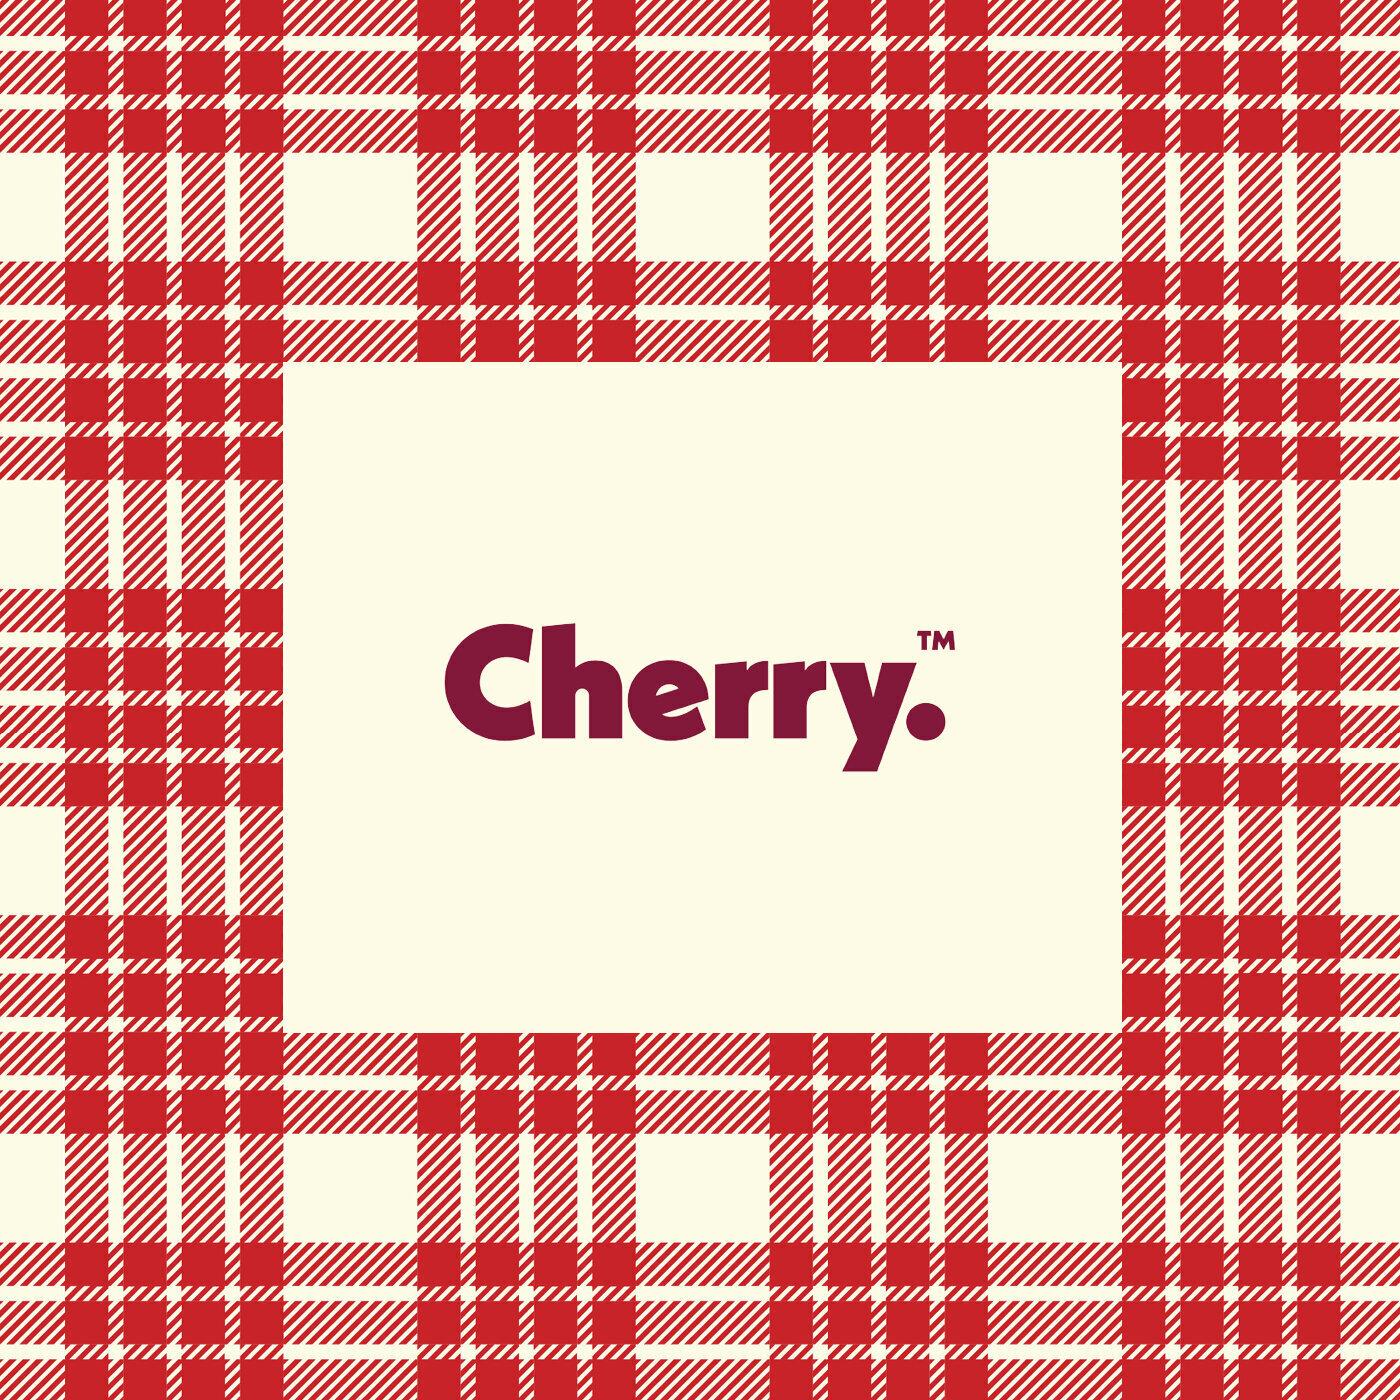 017_CHERRY_WEBSITE_PLATES-4.jpg